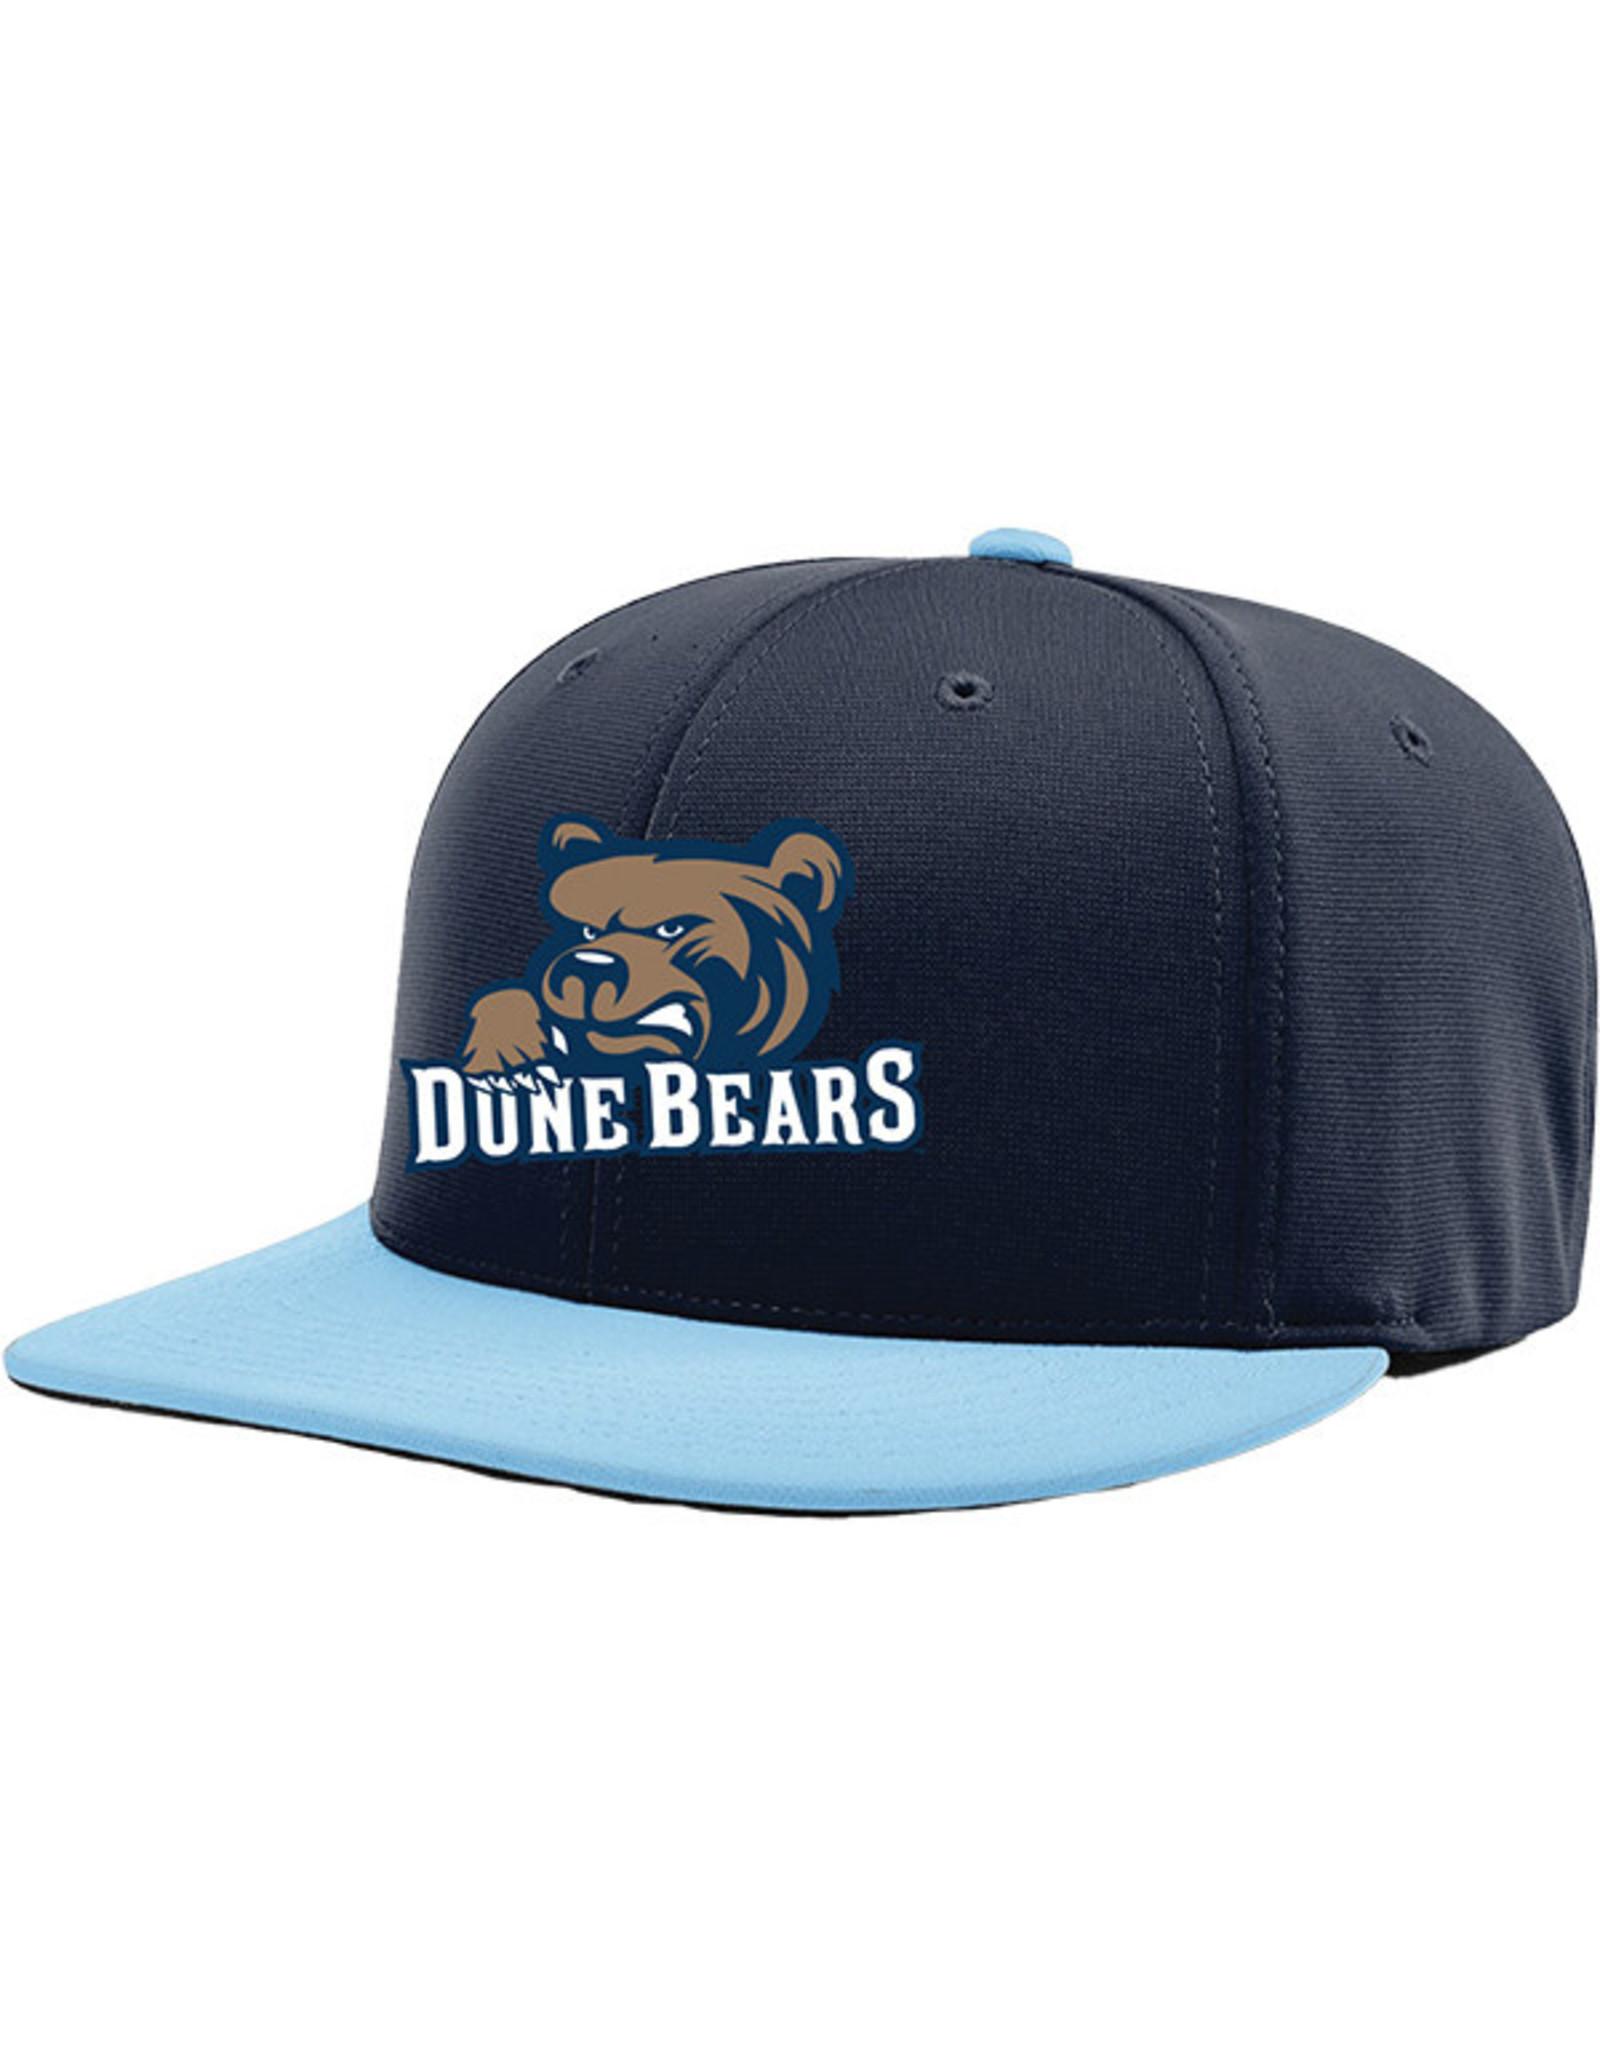 Richardson 1150 Dune Bears On-Field Navy/Columbia Cap